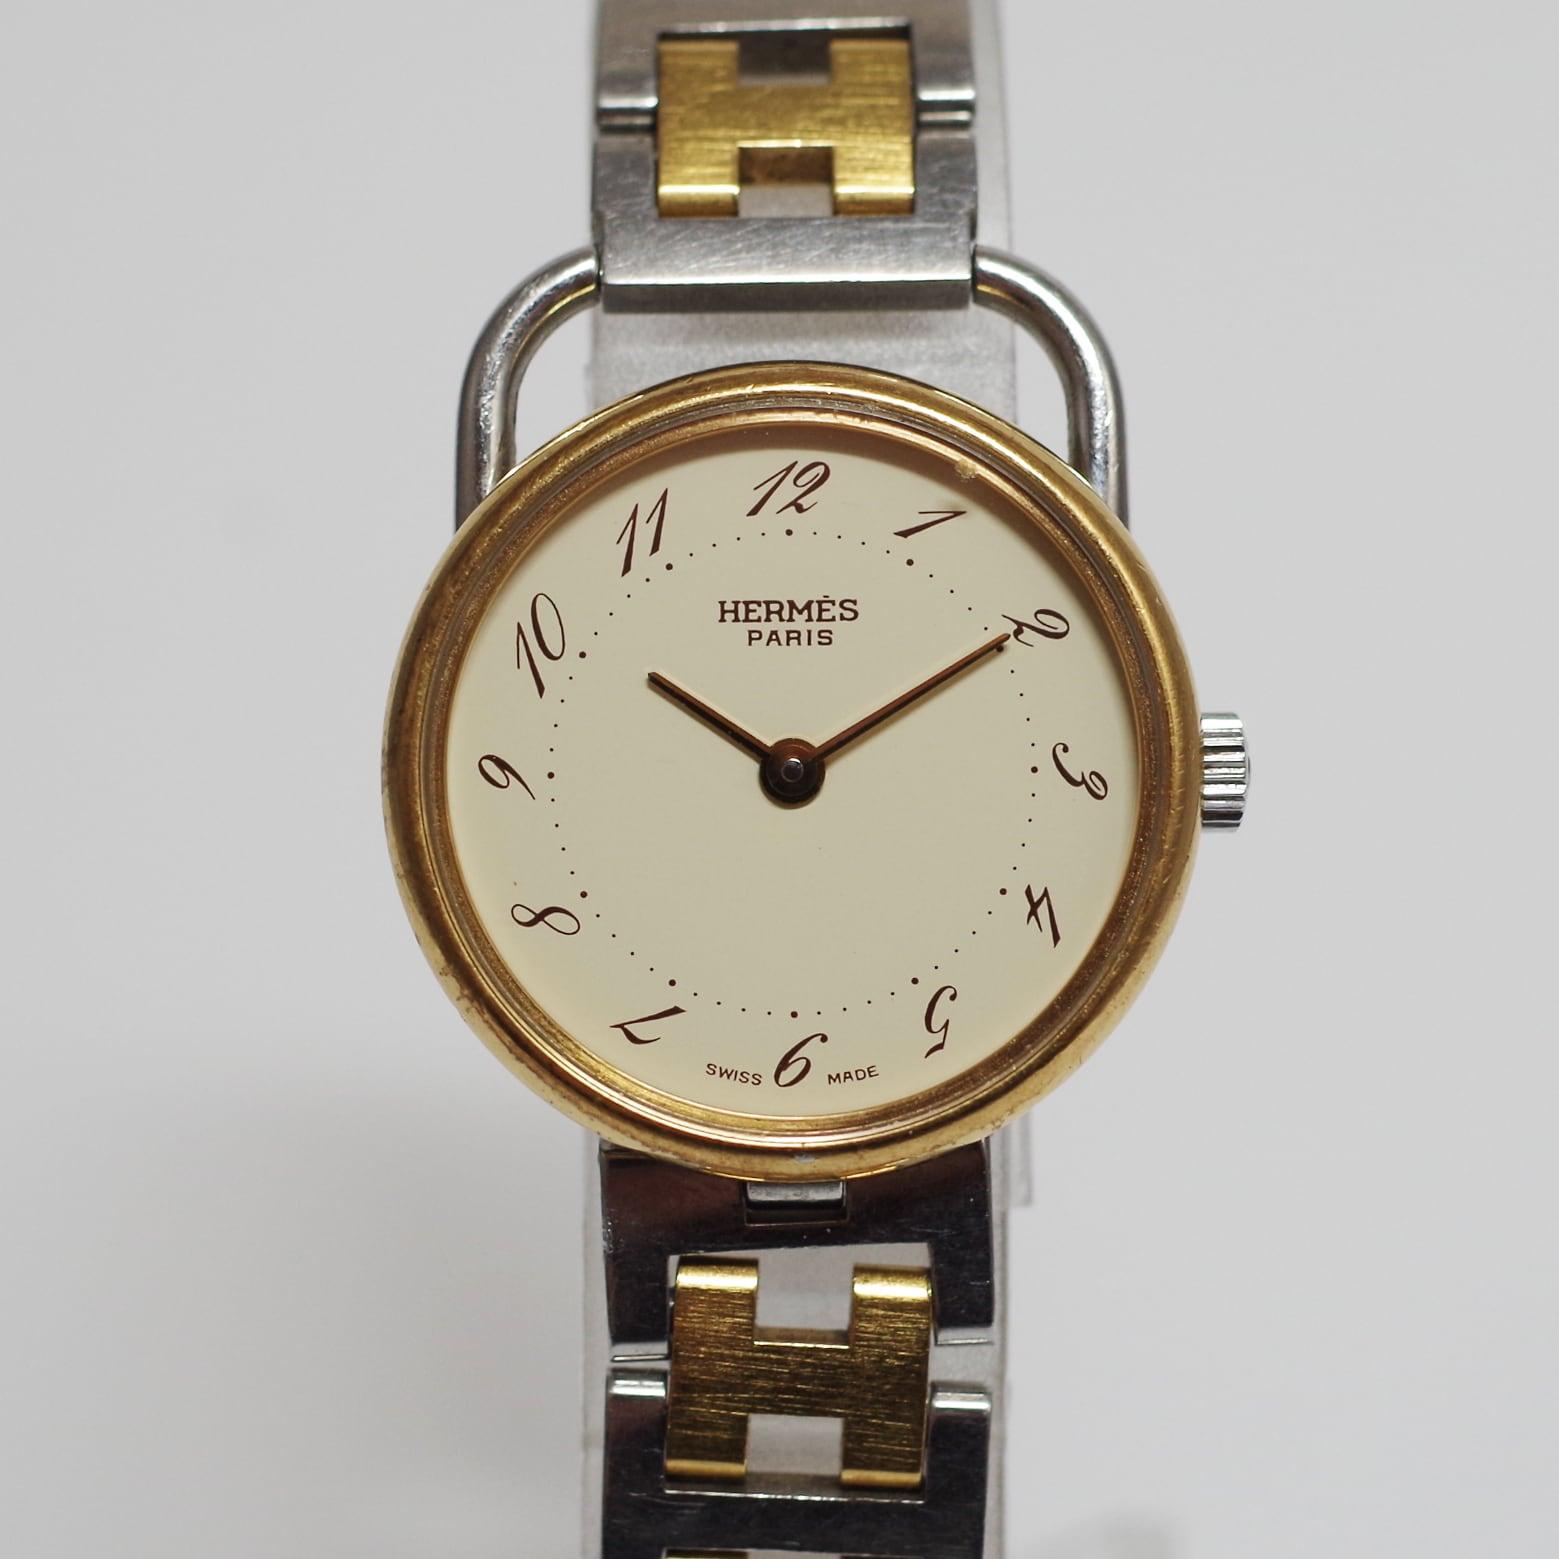 HERMES エルメス アルソー アイボリー文字盤 クォーツ SS コンビ 腕時計 レディース